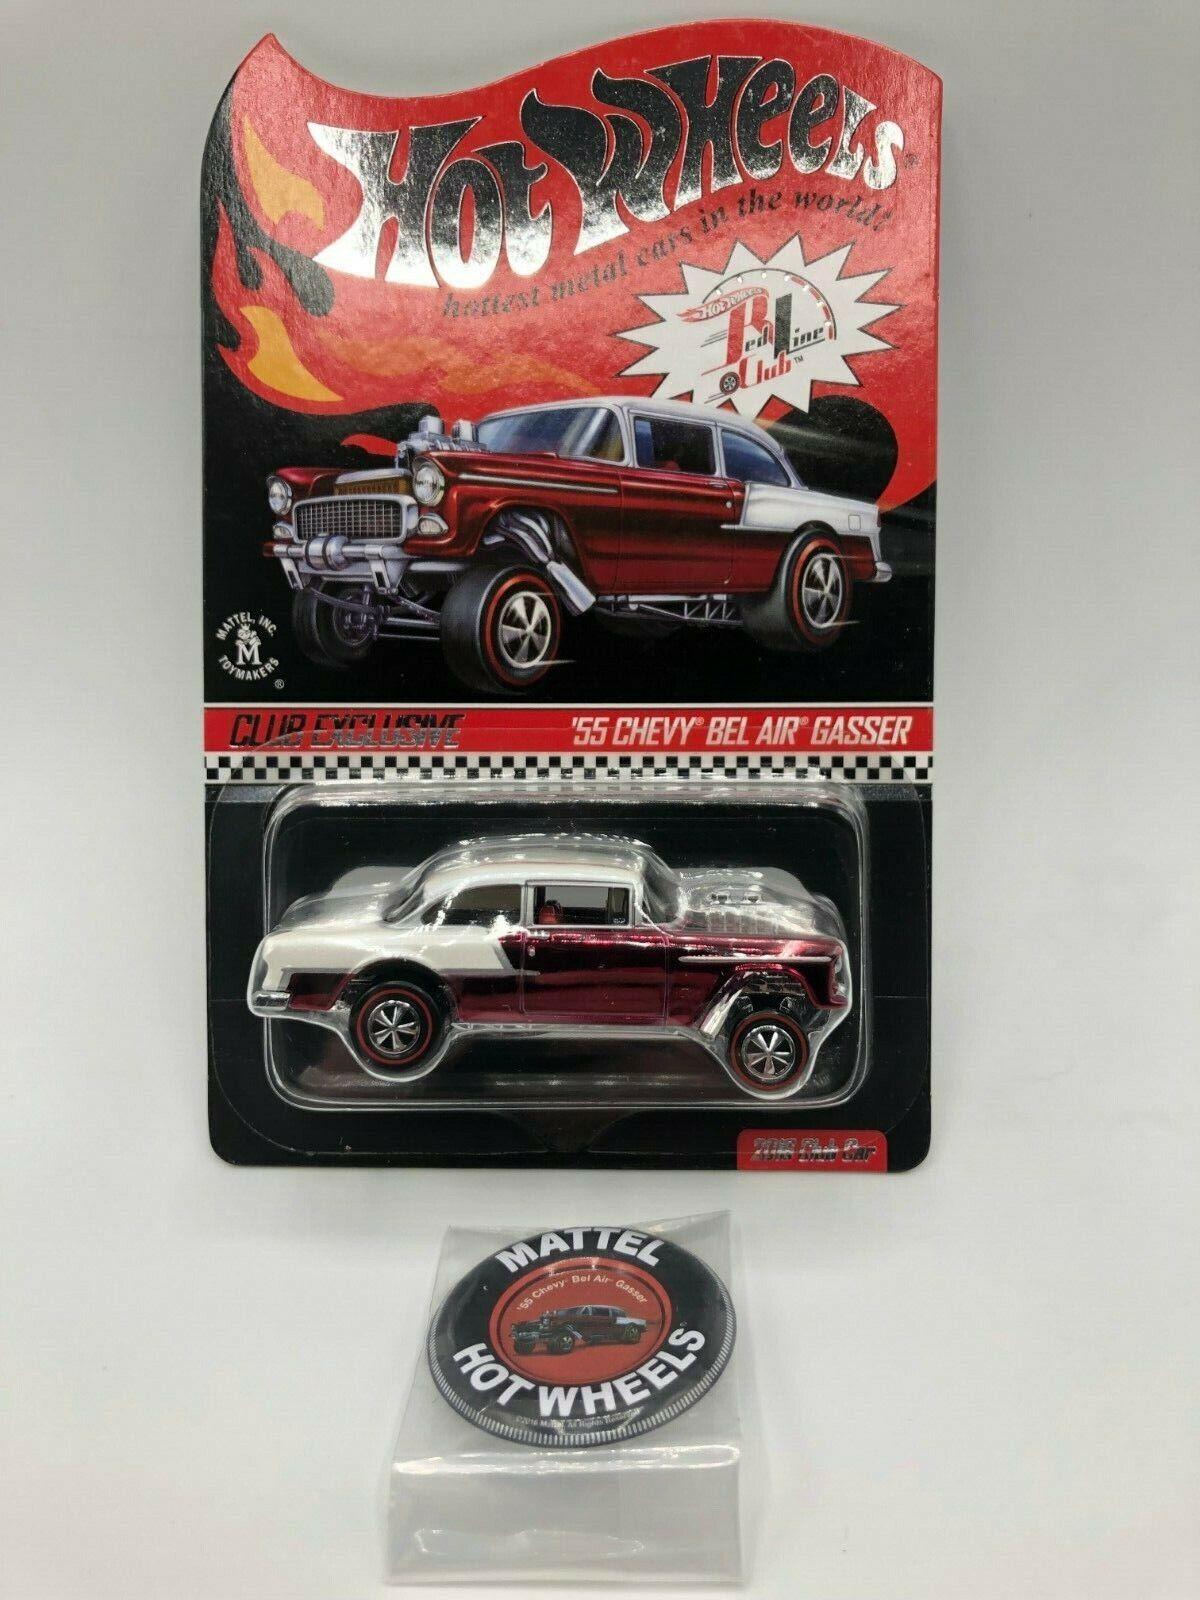 Hot Wheels Club Exclusive 55 Chevy Bel Air Gasser 2016 MIBP